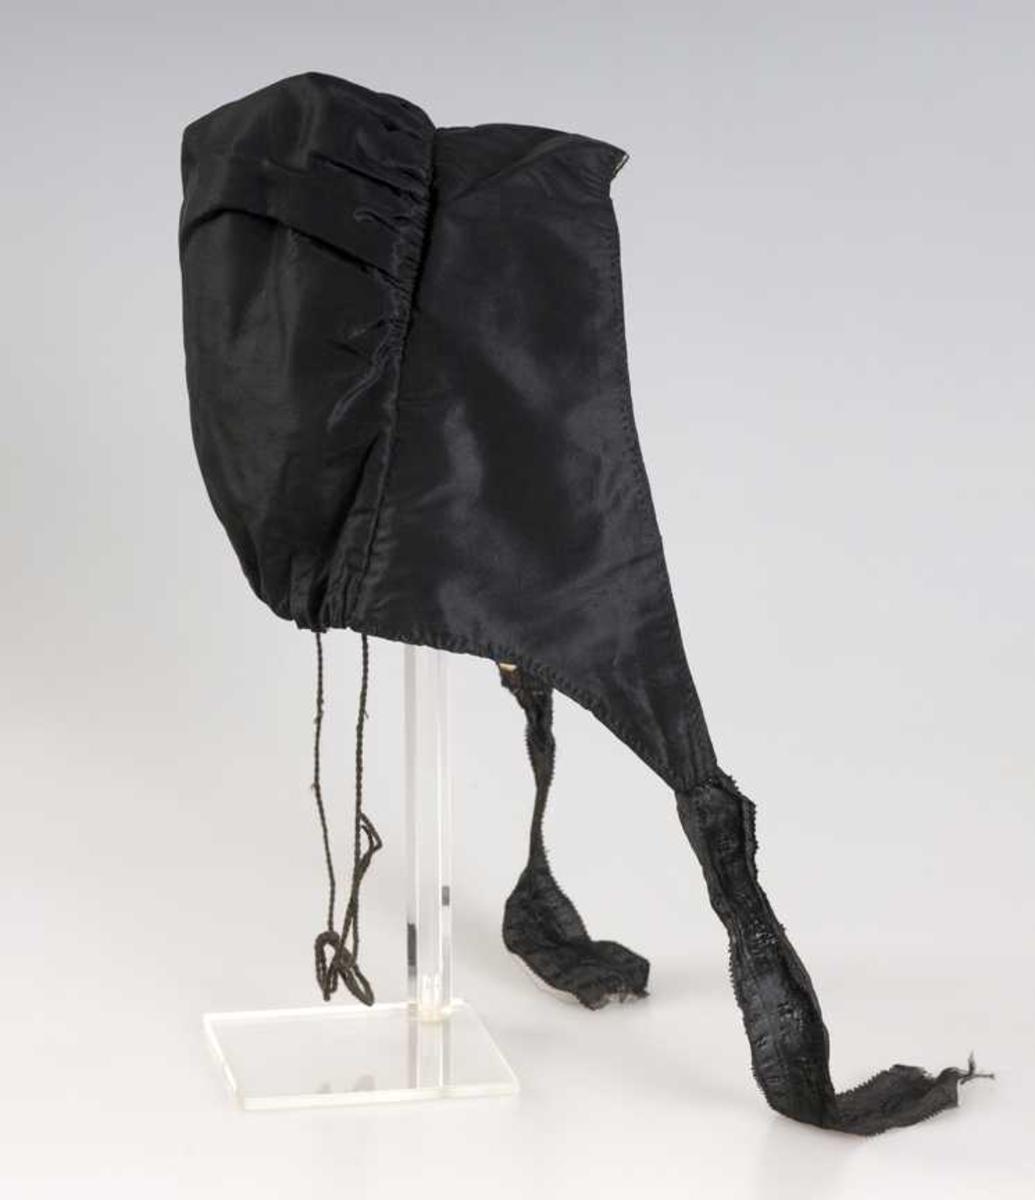 Rynkelue i svart silketaft, med svarte mønstervevde silkeband til knyting.